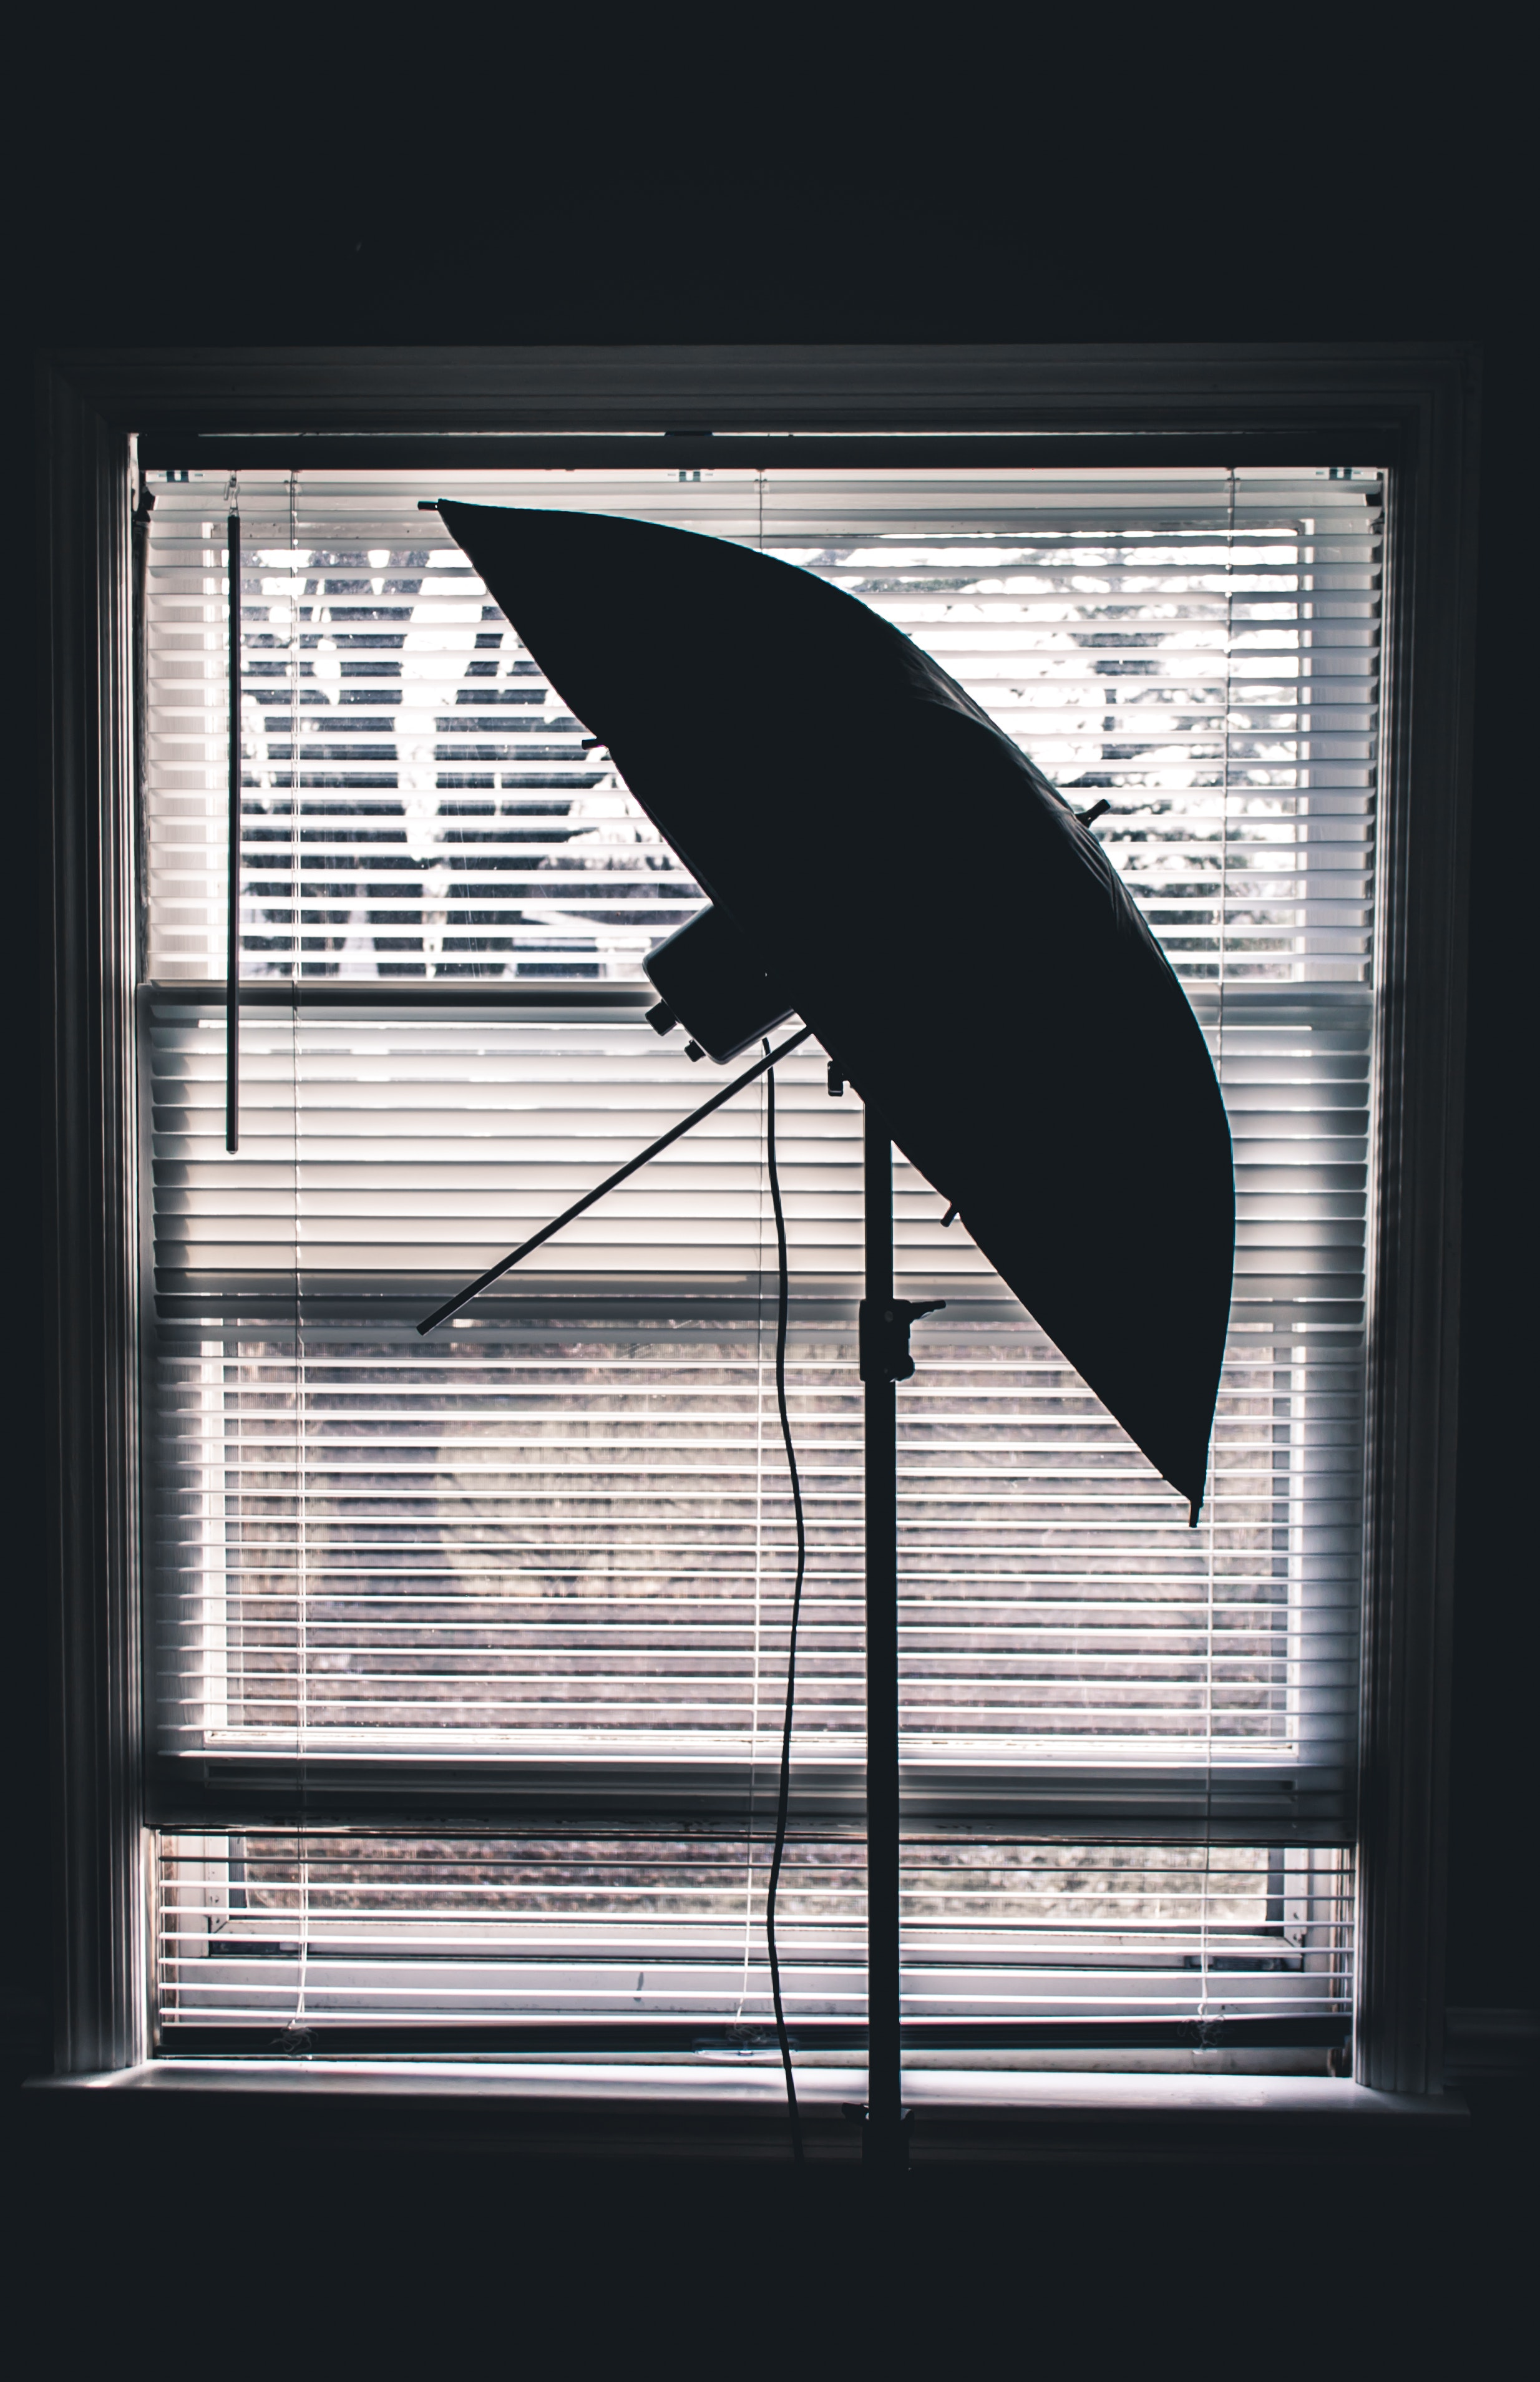 co c el window best solar hills control blinds coverings dorado silhouette shades